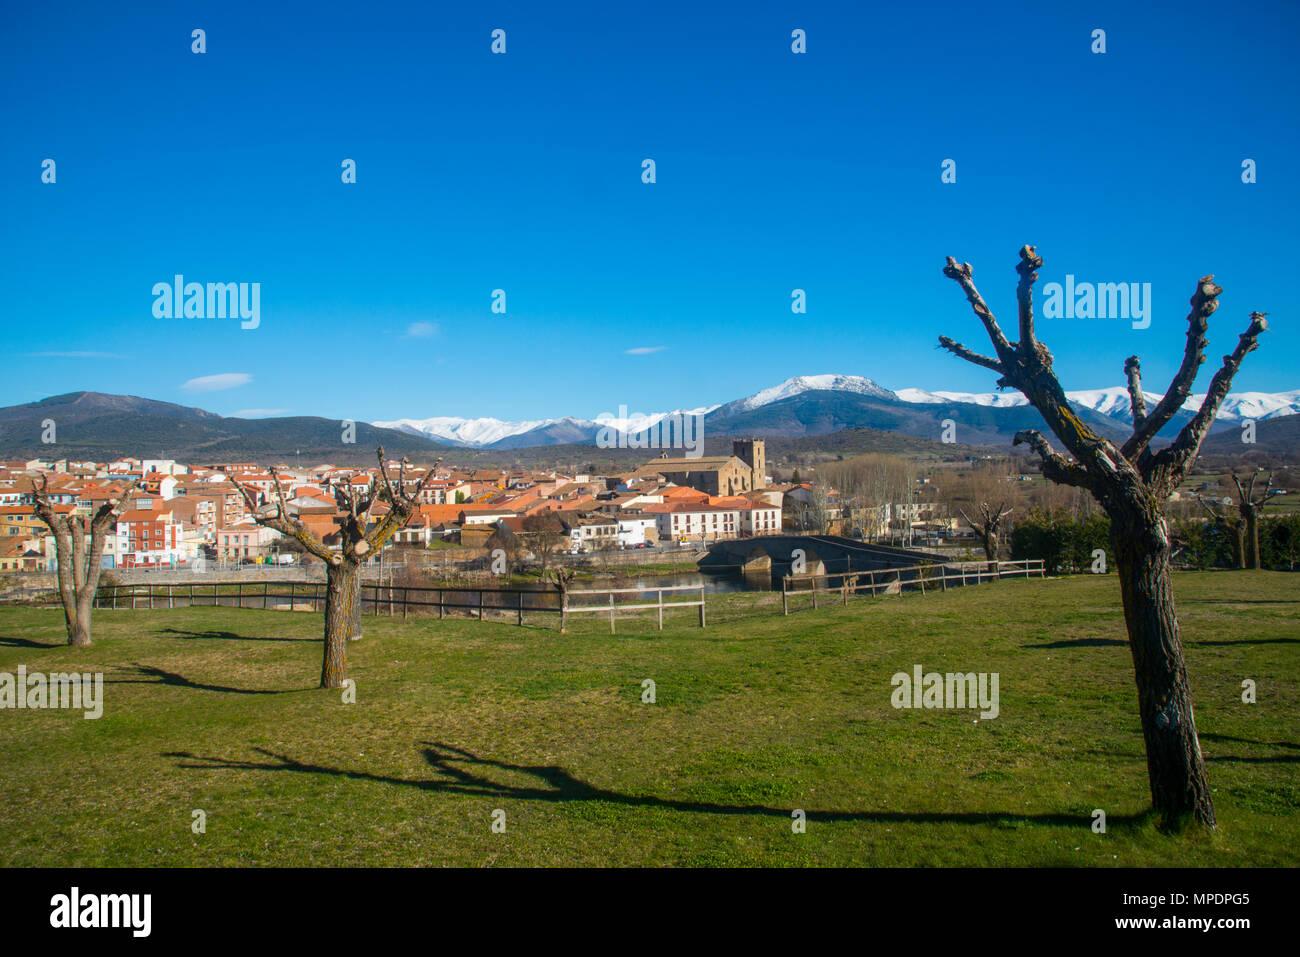 Overview. El Barco de Avila, Avila province, Castilla Leon, Spain. Stock Photo